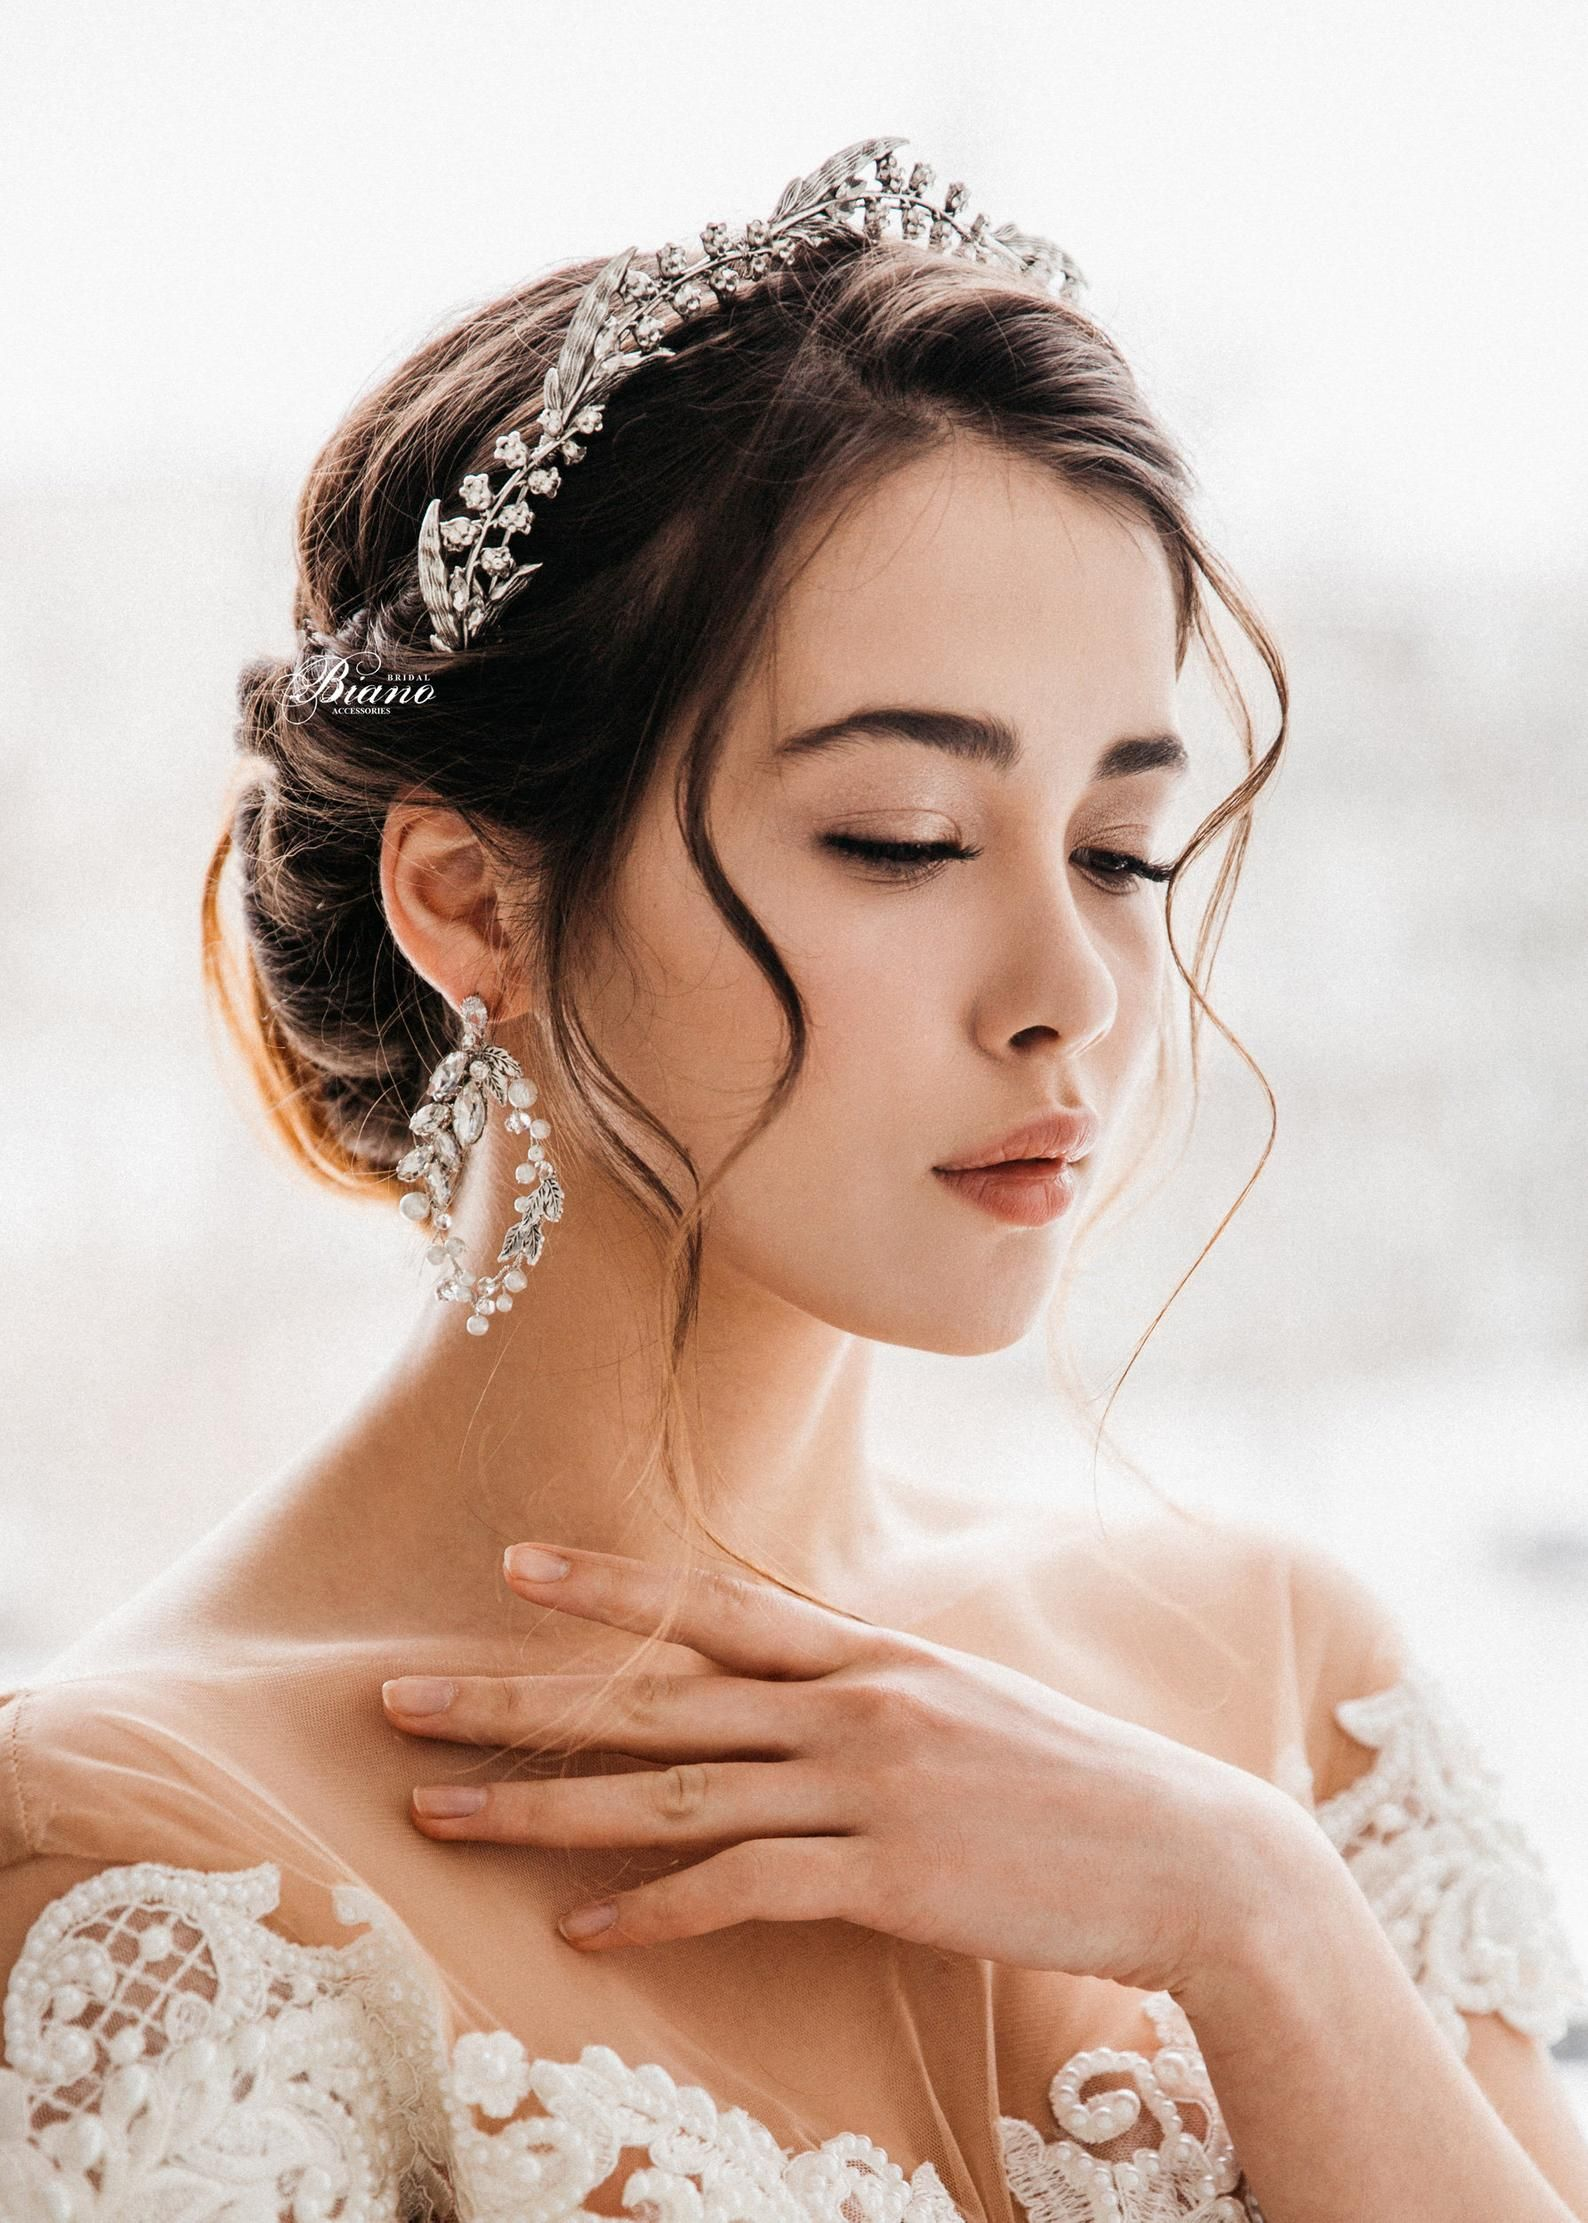 Bridal Silver Tiara Wedding Leaf Tiara Wedding Crown Etsy Tiara Hairstyles Bridal Hair Headpiece Wedding Hair Accessories